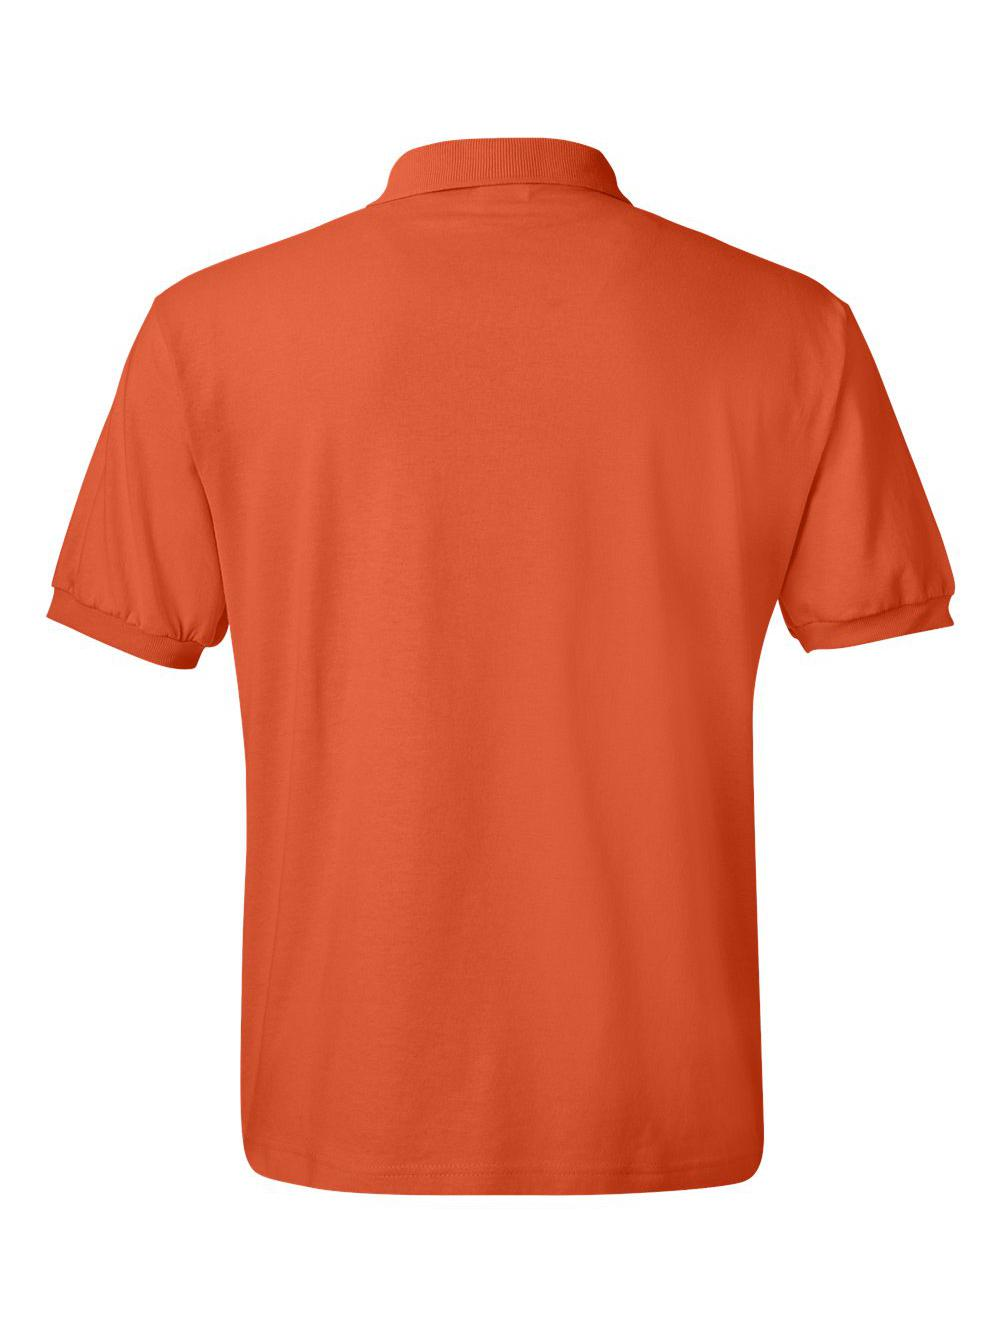 Hanes-Ecosmart-Jersey-Sport-Shirt-054X thumbnail 37